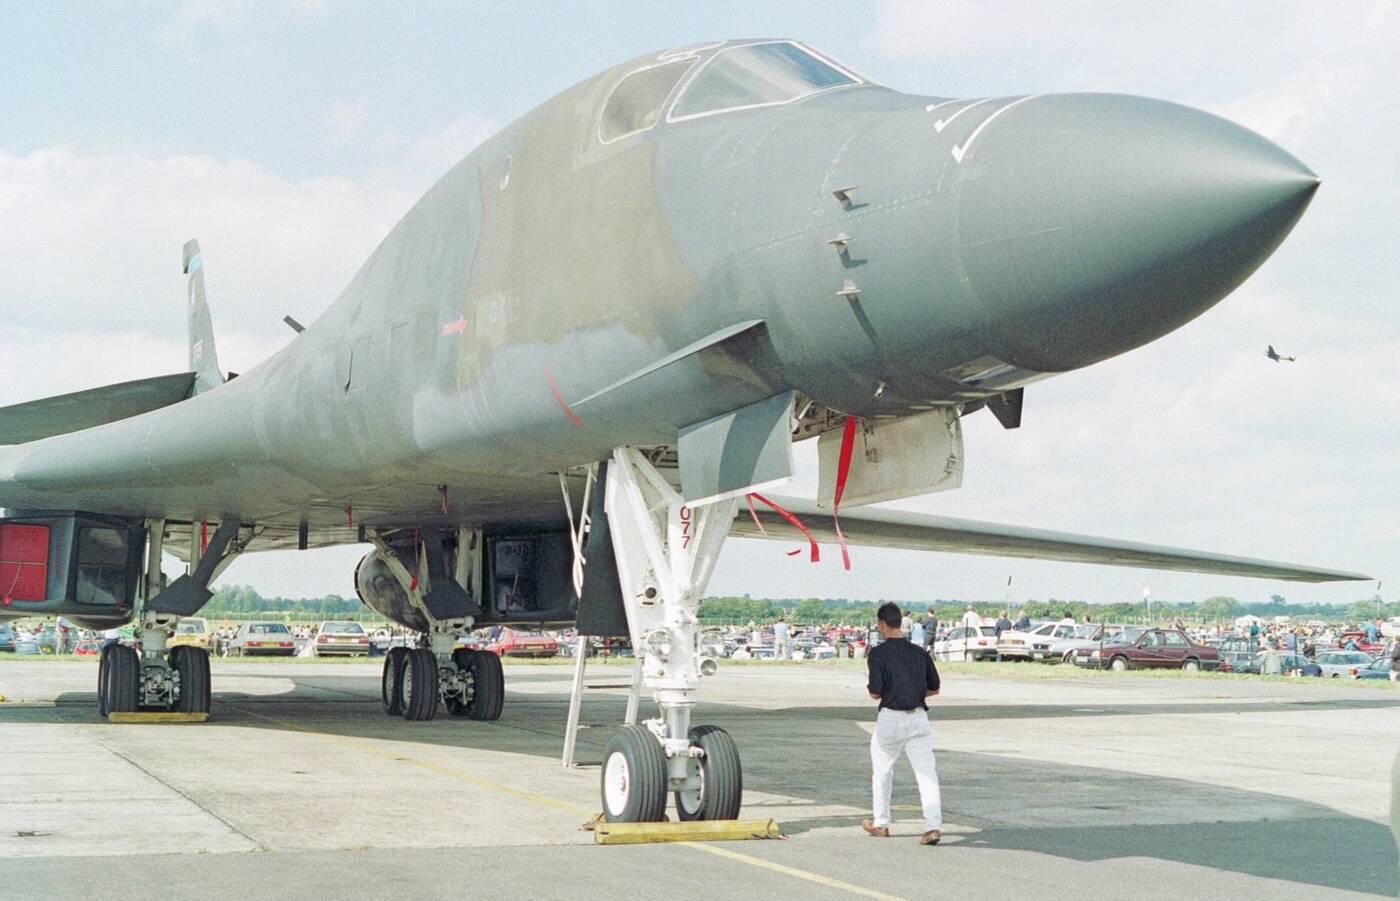 bombowce B-1B Lancer, B-1B Lancer, los B-1B Lancer, starzejące się bombowce